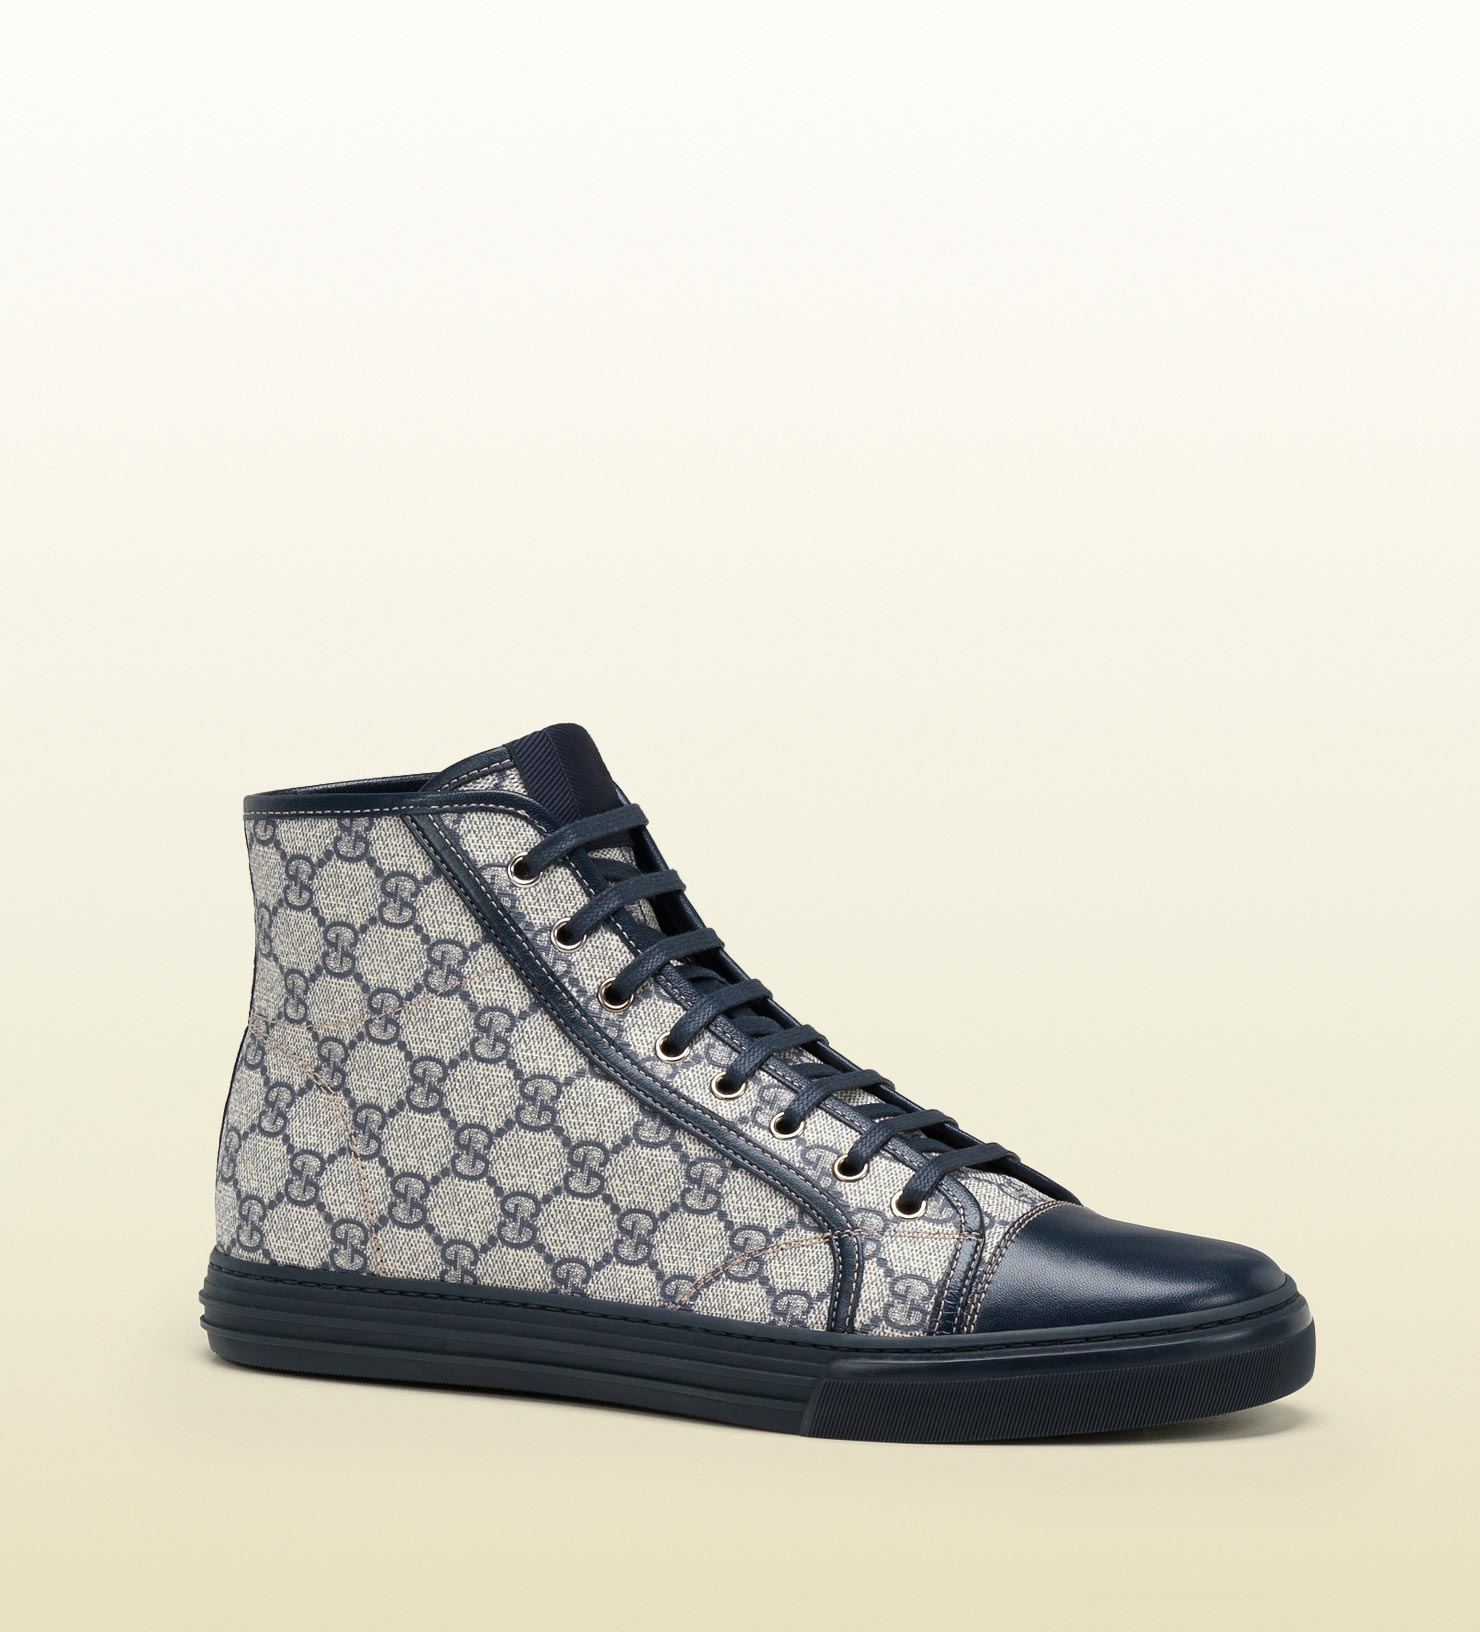 Blue Dragon Gucci Shoes